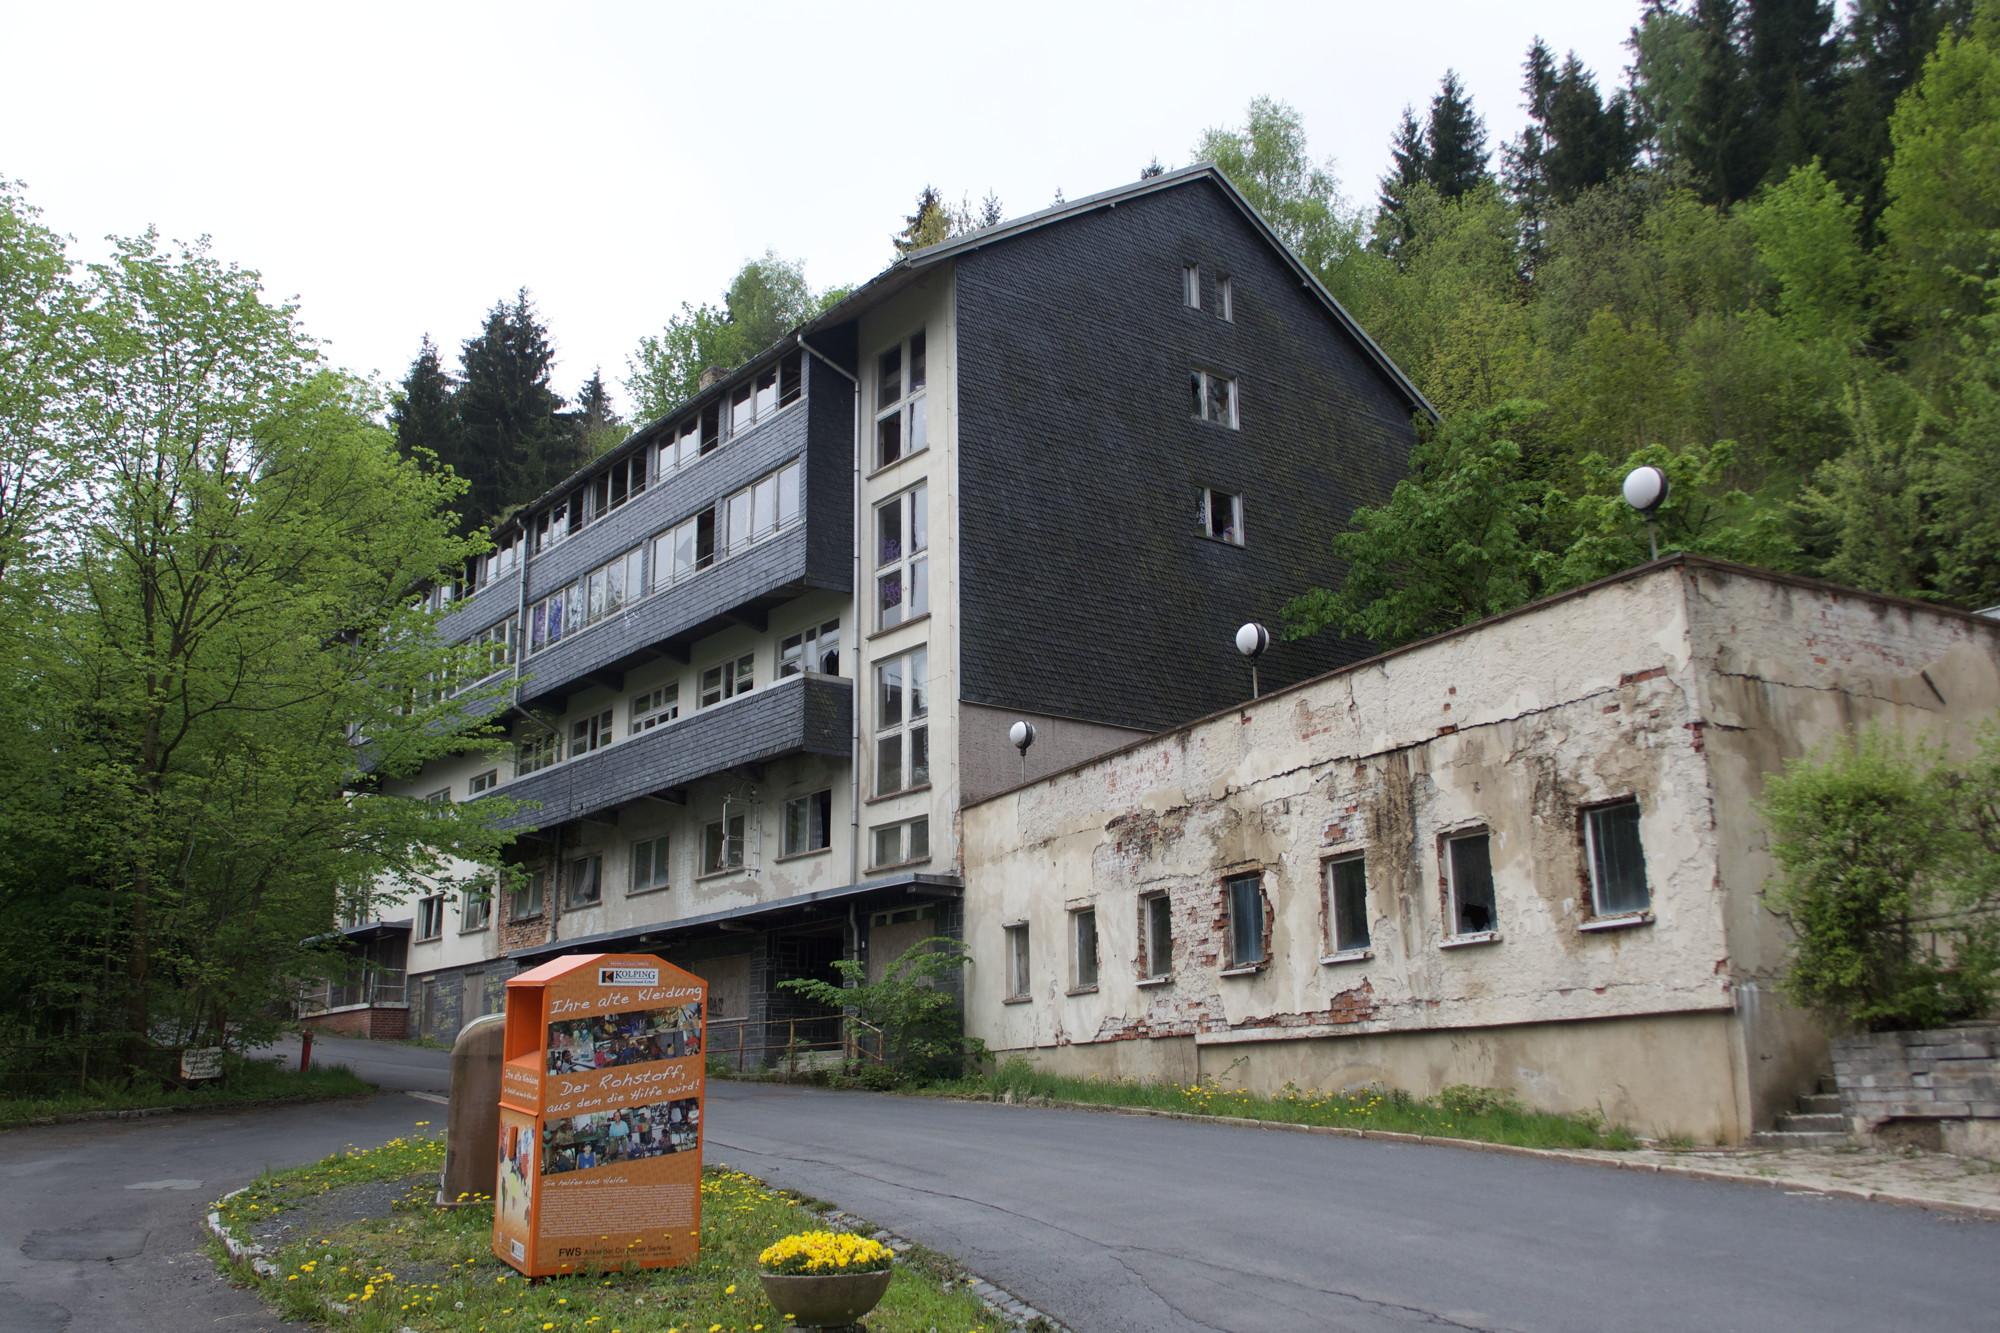 Das Erholungsheim Altin in Lauscha